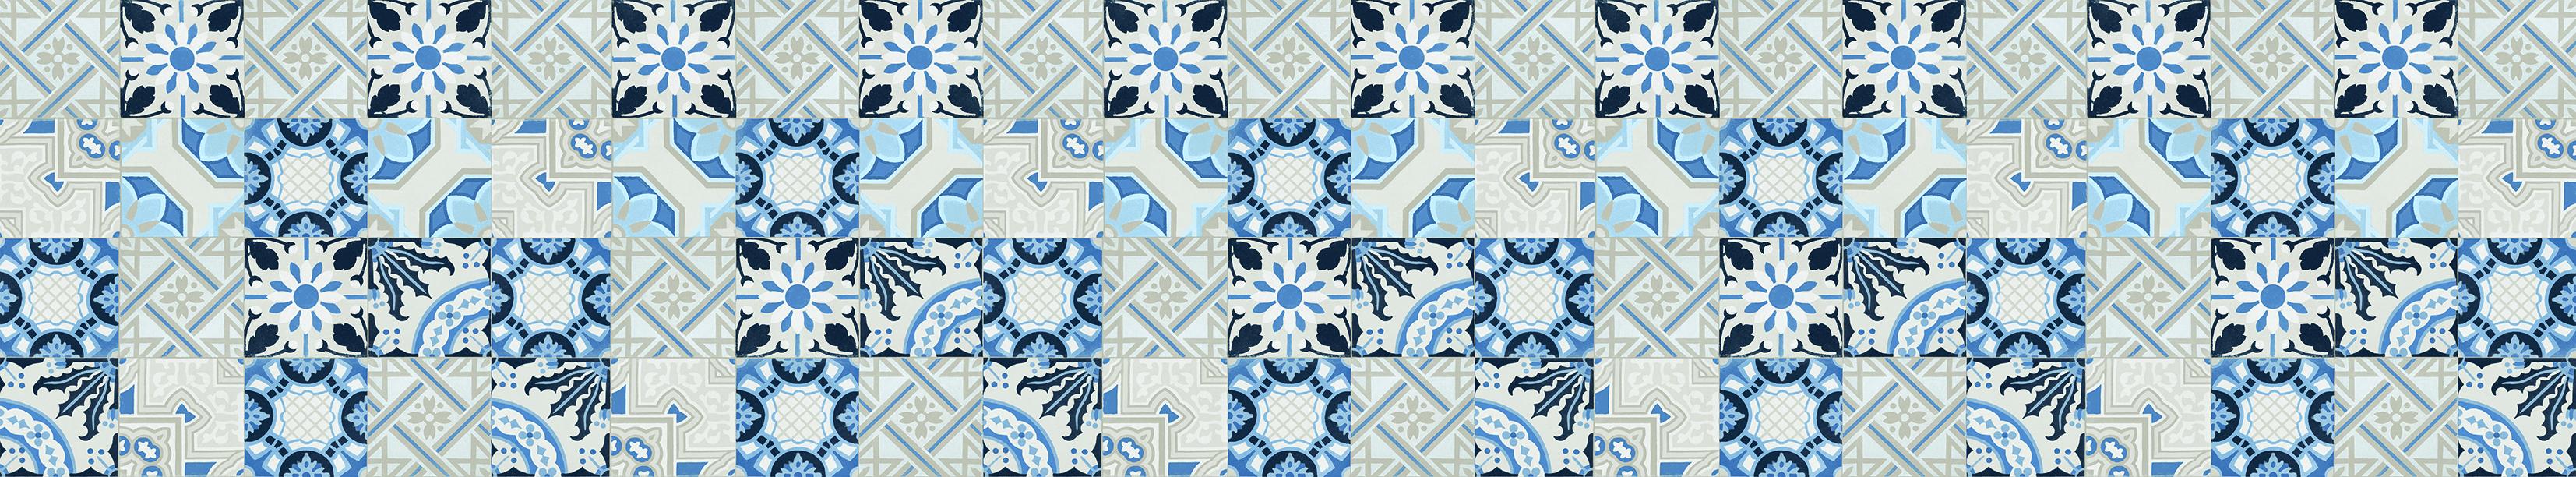 522_Dekor_Floral blau